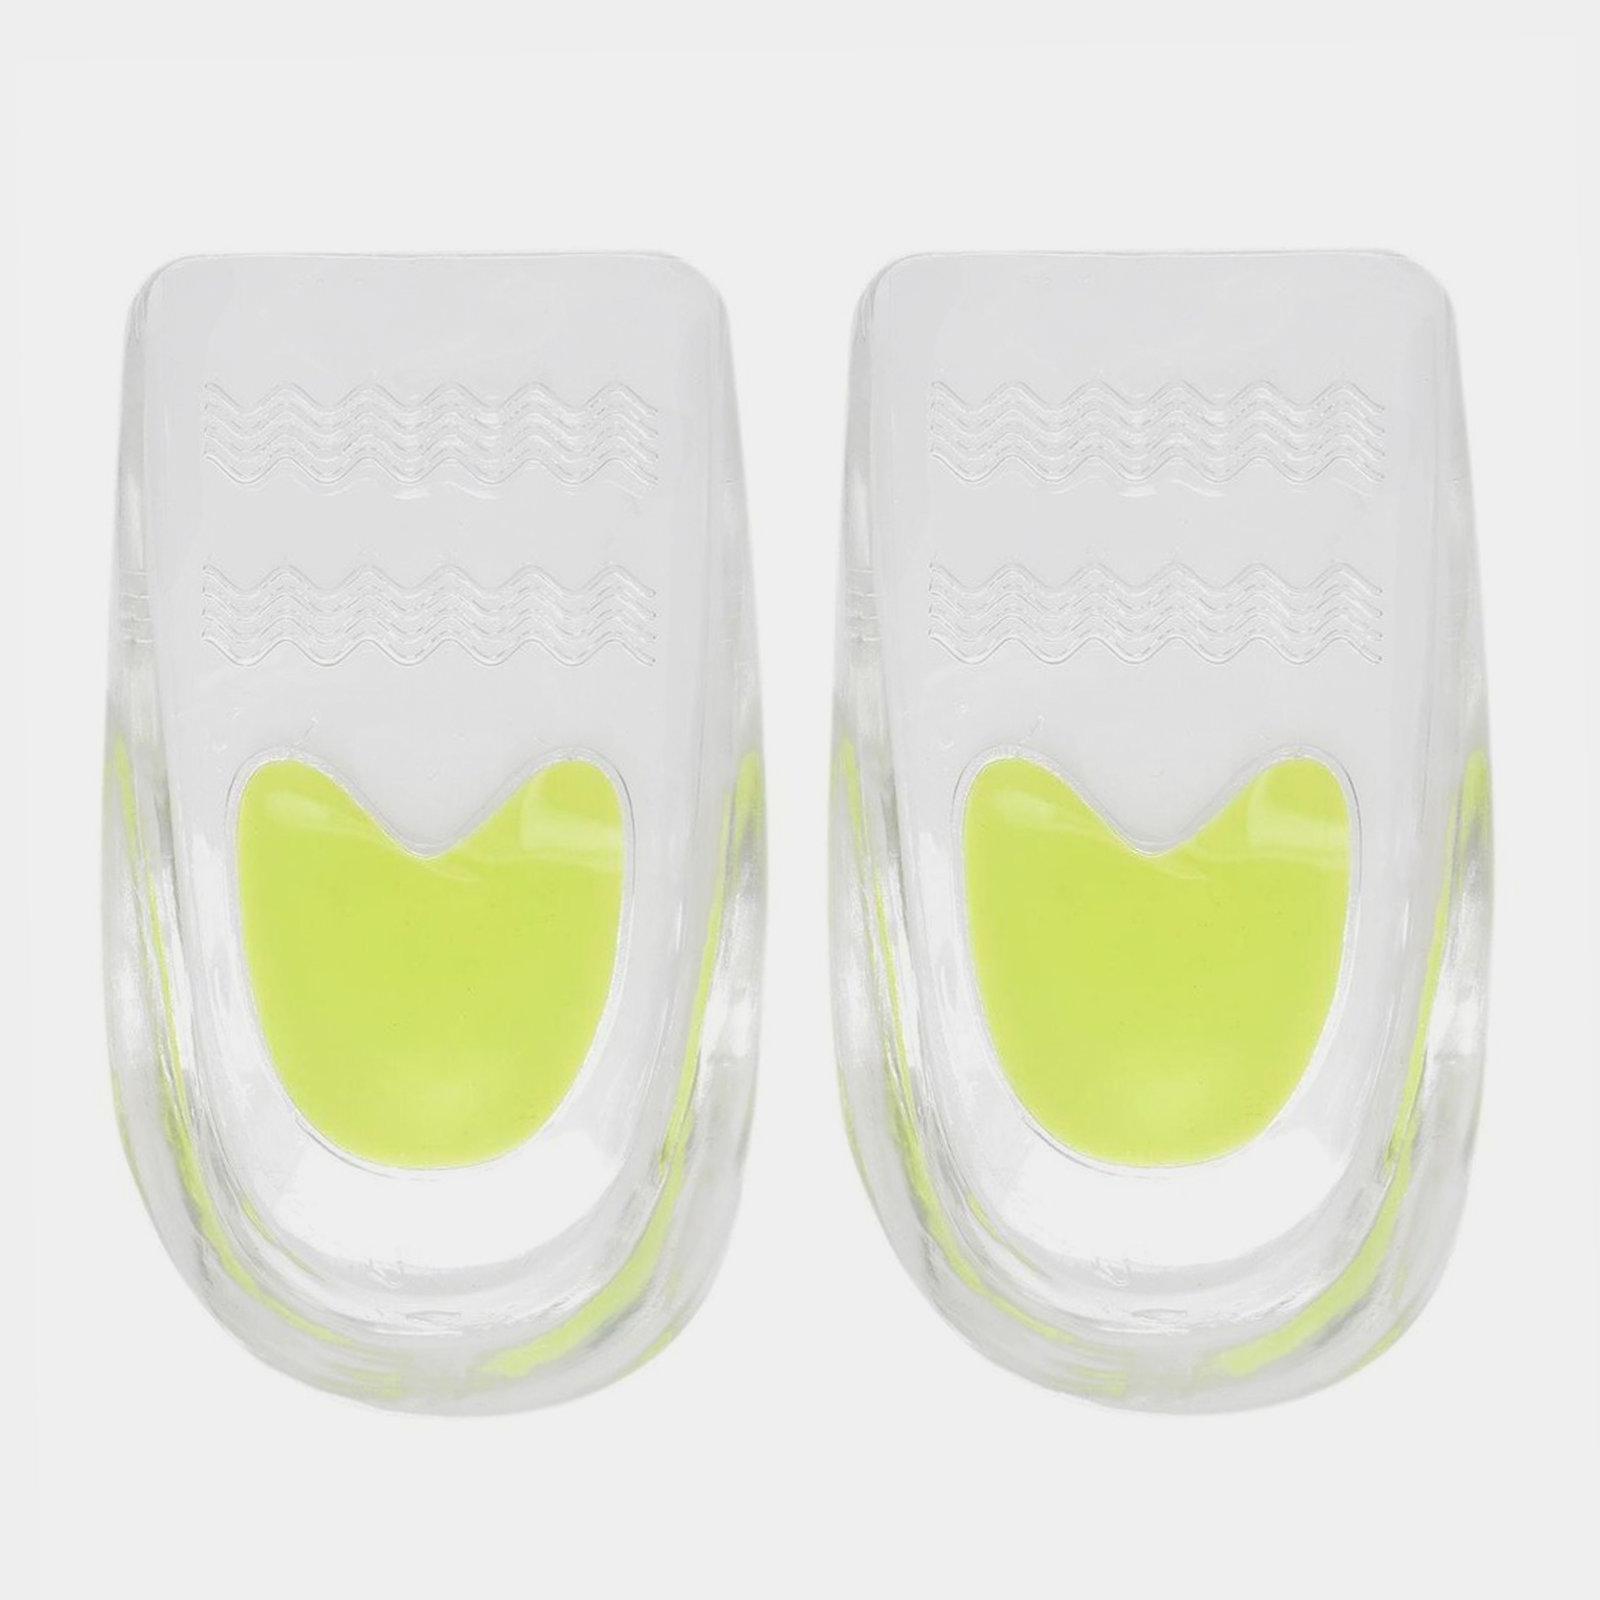 Perforated Gel Heel Cups